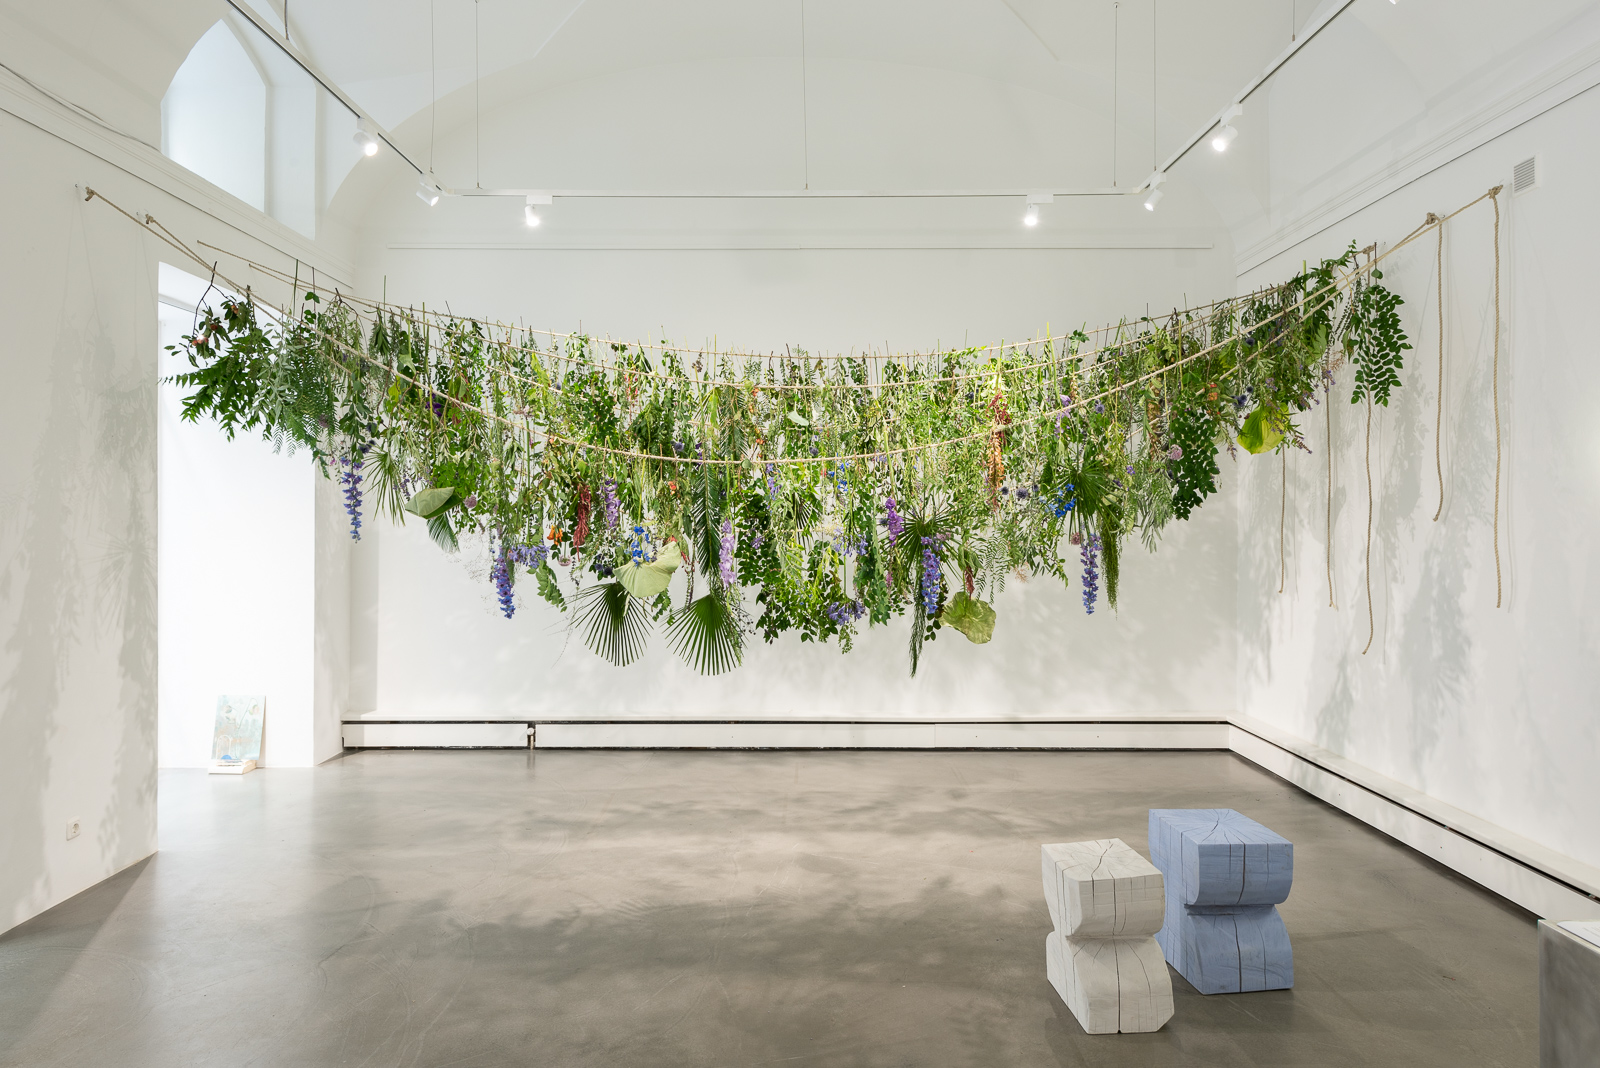 Evalie Wagner, Jardin perdu, 2019 photographed by Matthias Aschauer